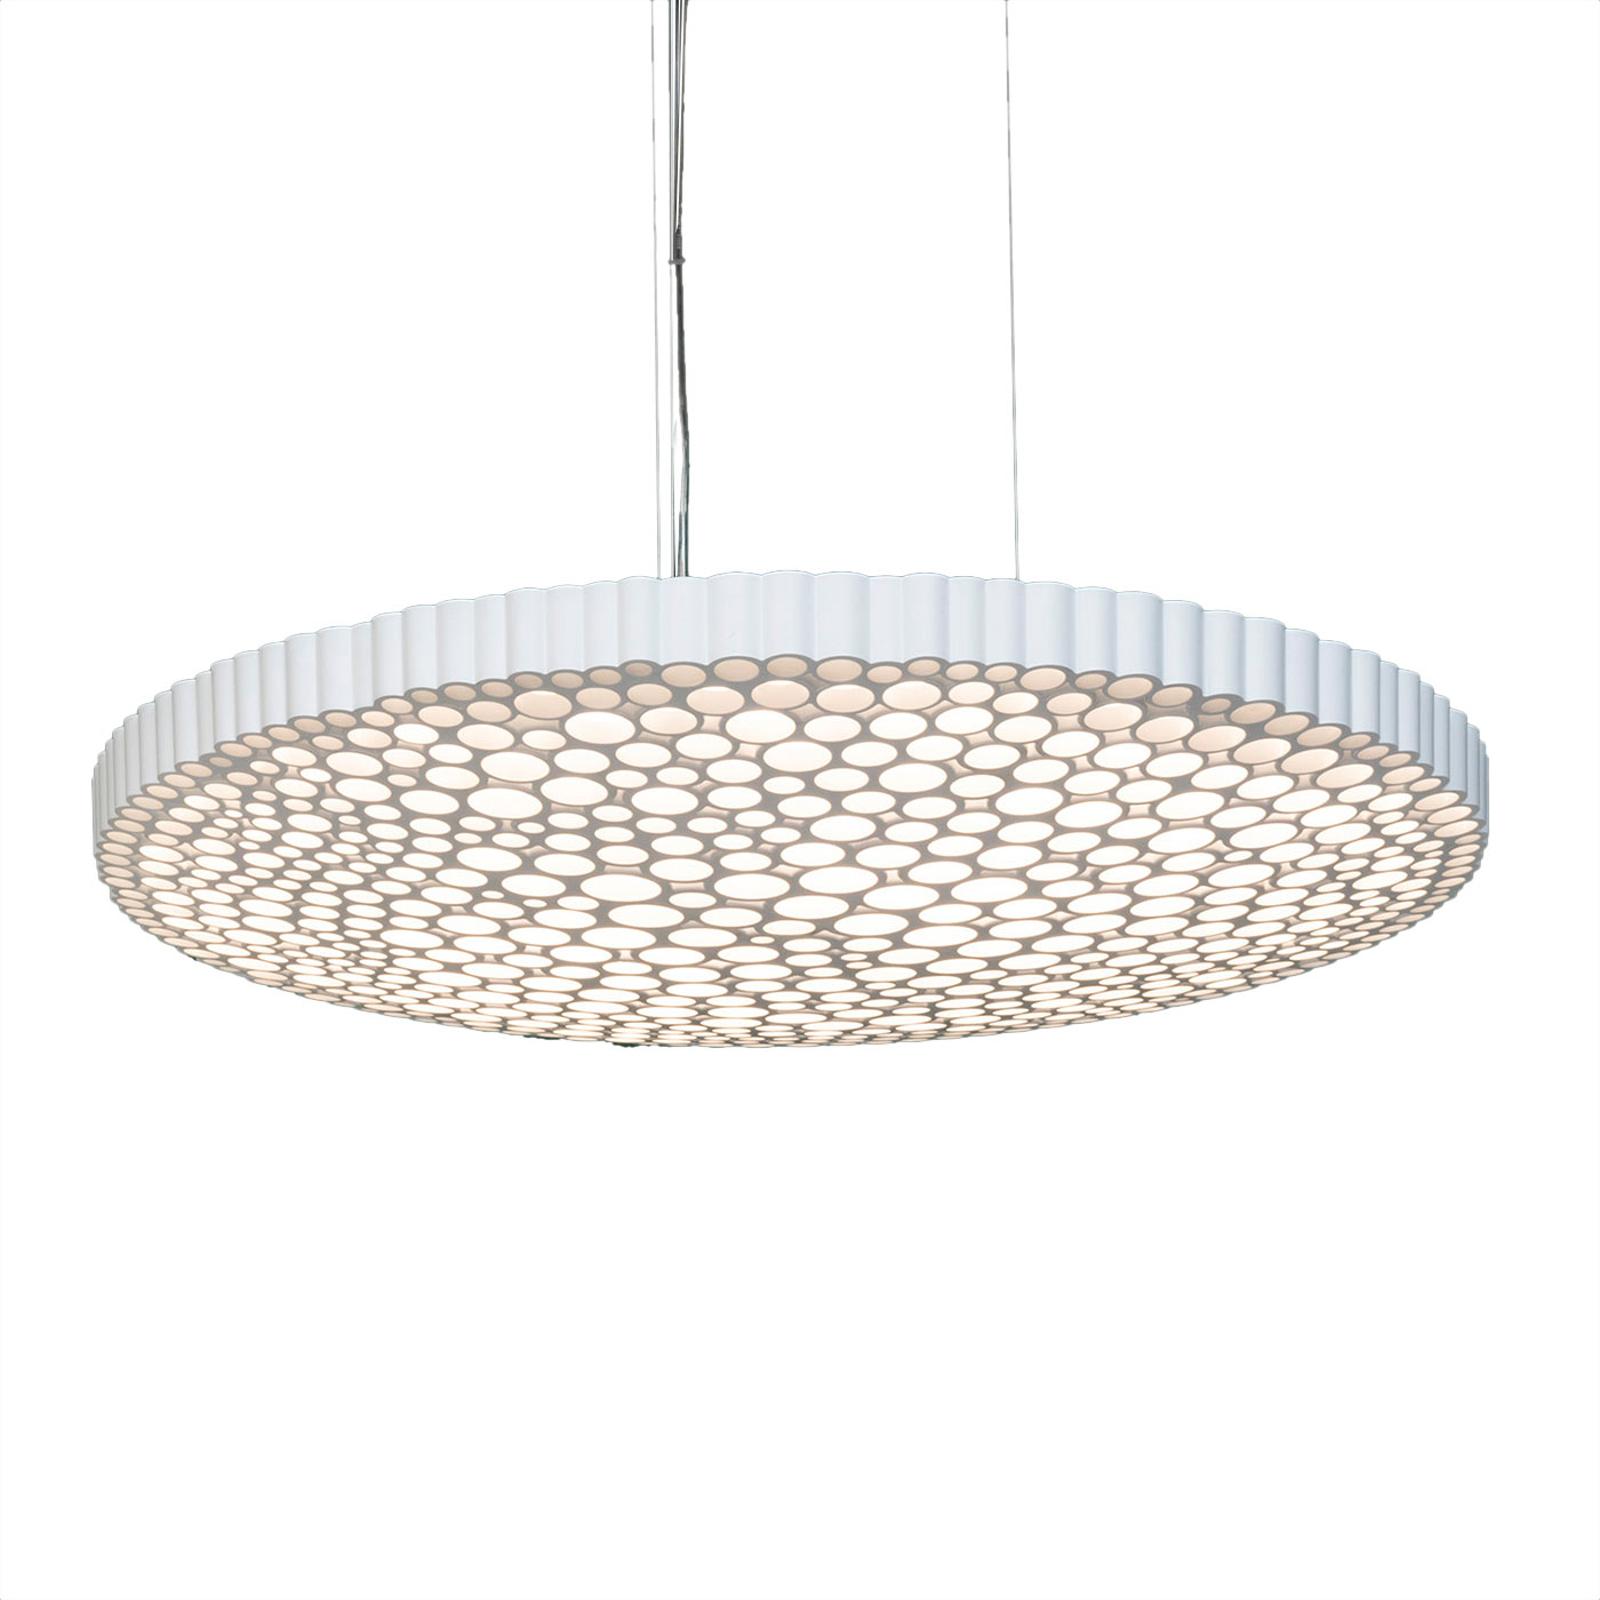 Artemide Calipso LED-pendellampe 2700 K